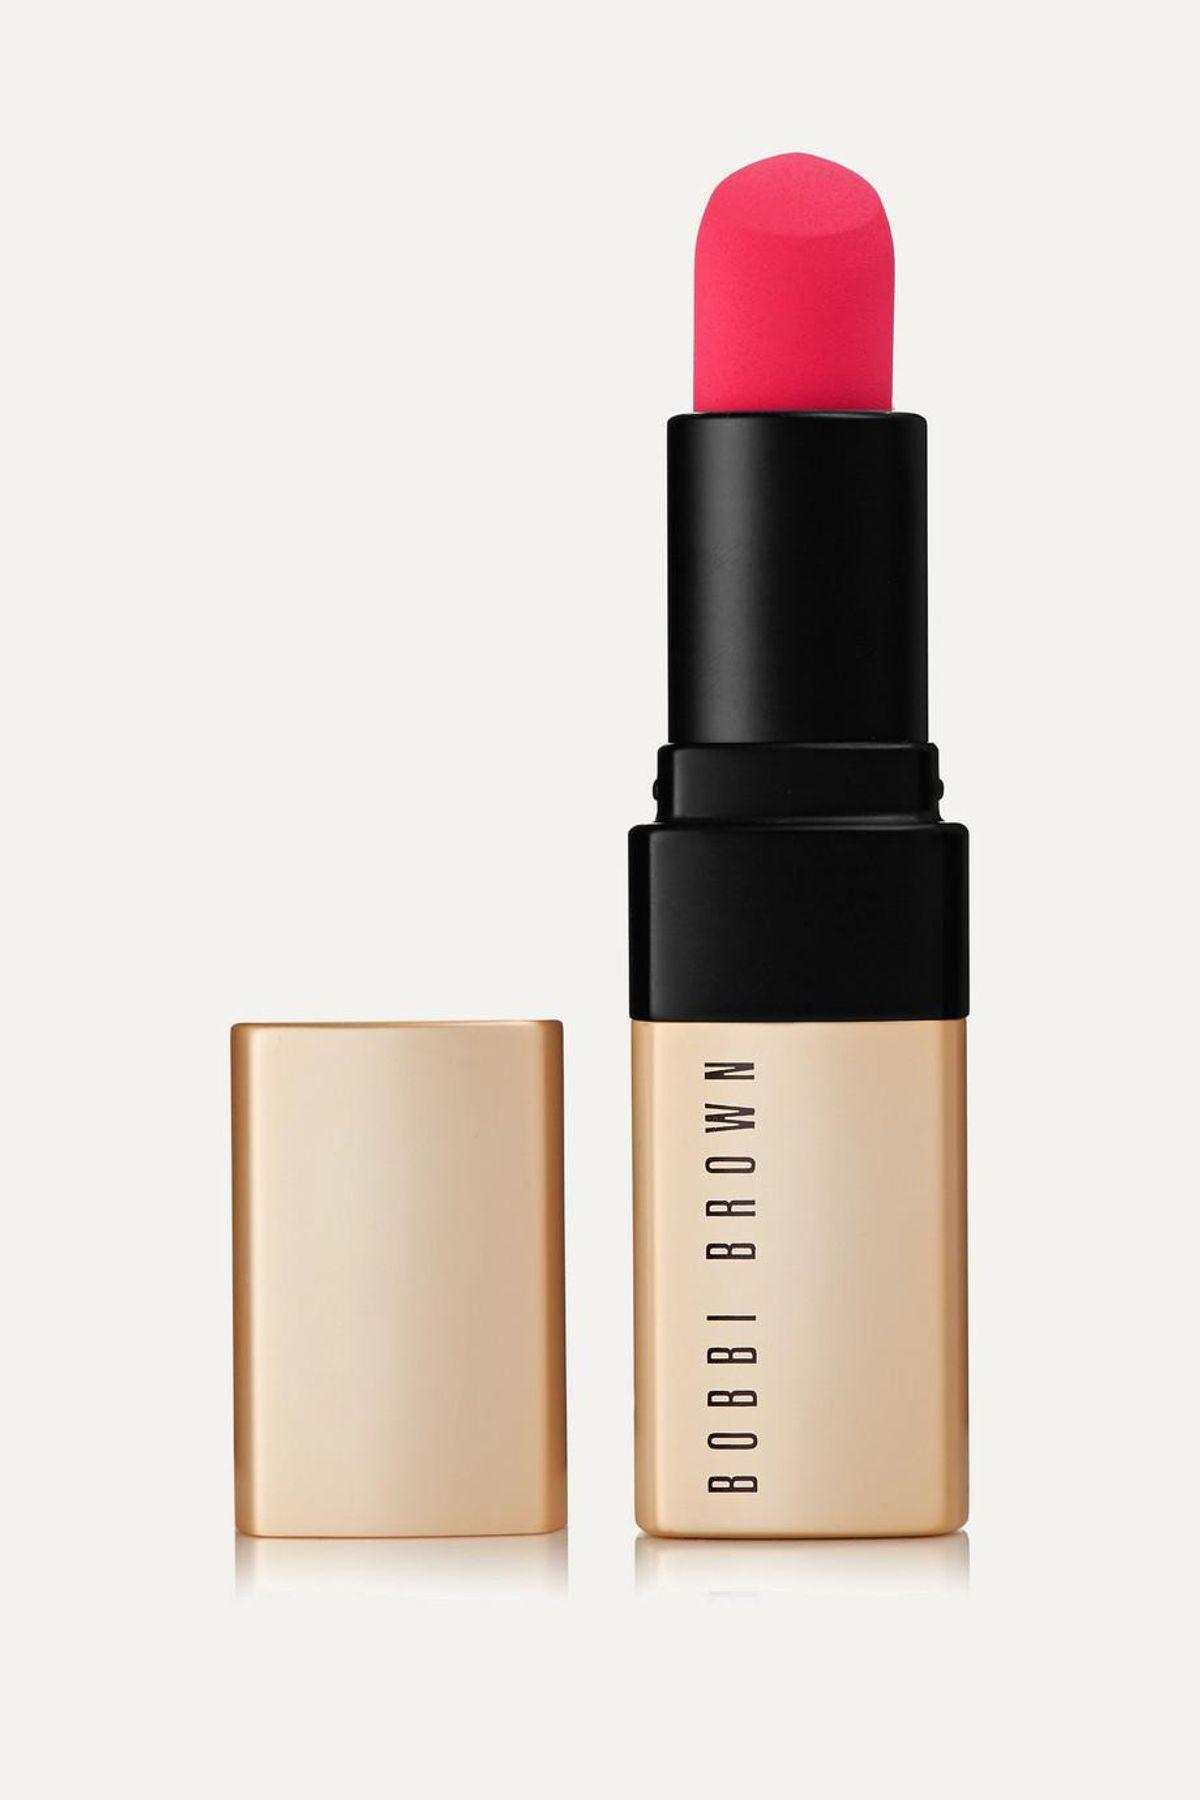 bobbi brown luxe matte lip color in bold nectar